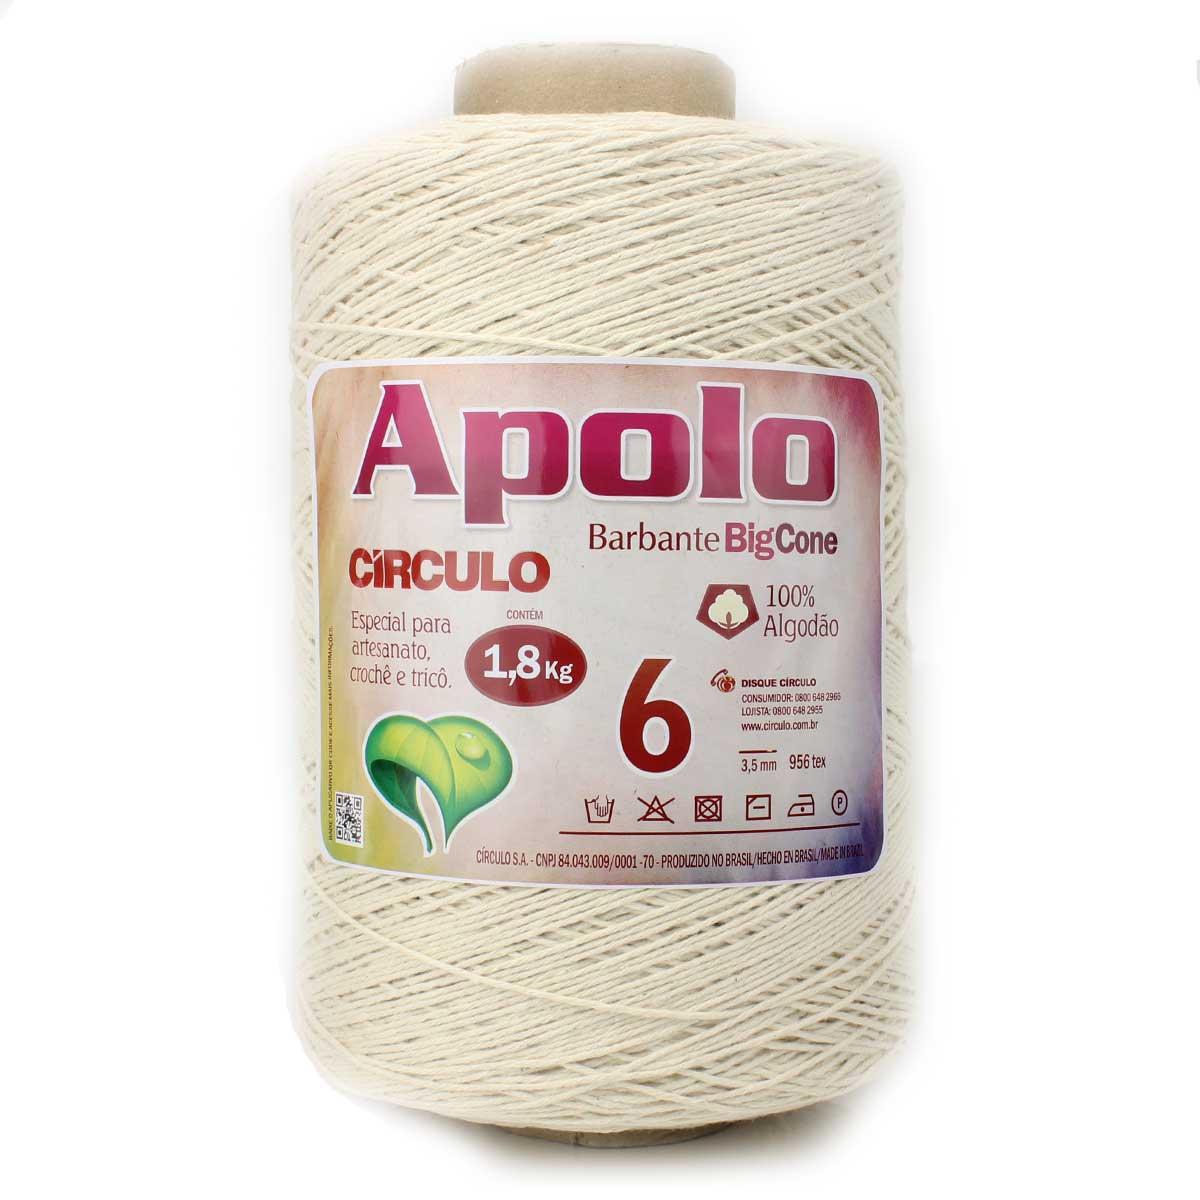 Barbante Apolo Crú N06 1,8kg - Círculo